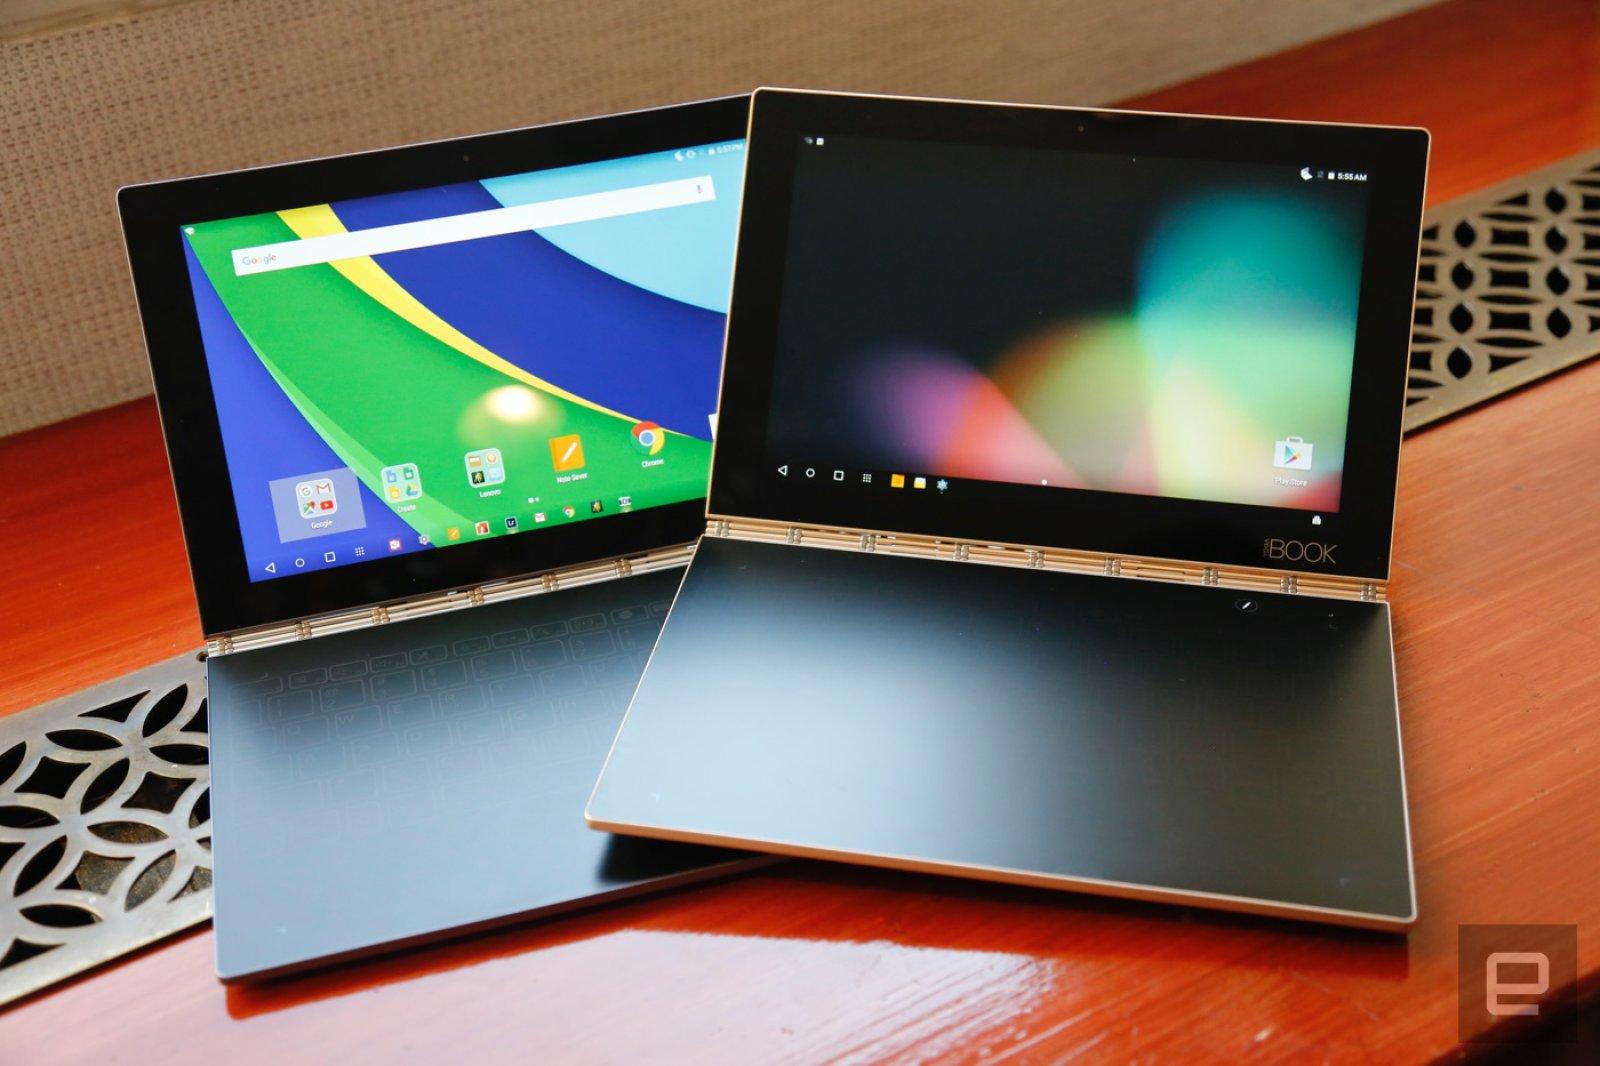 Lenovo na IFA – Moto Z Play, Yoga Tab 3 Plus, Miix 510 a Yoga Book